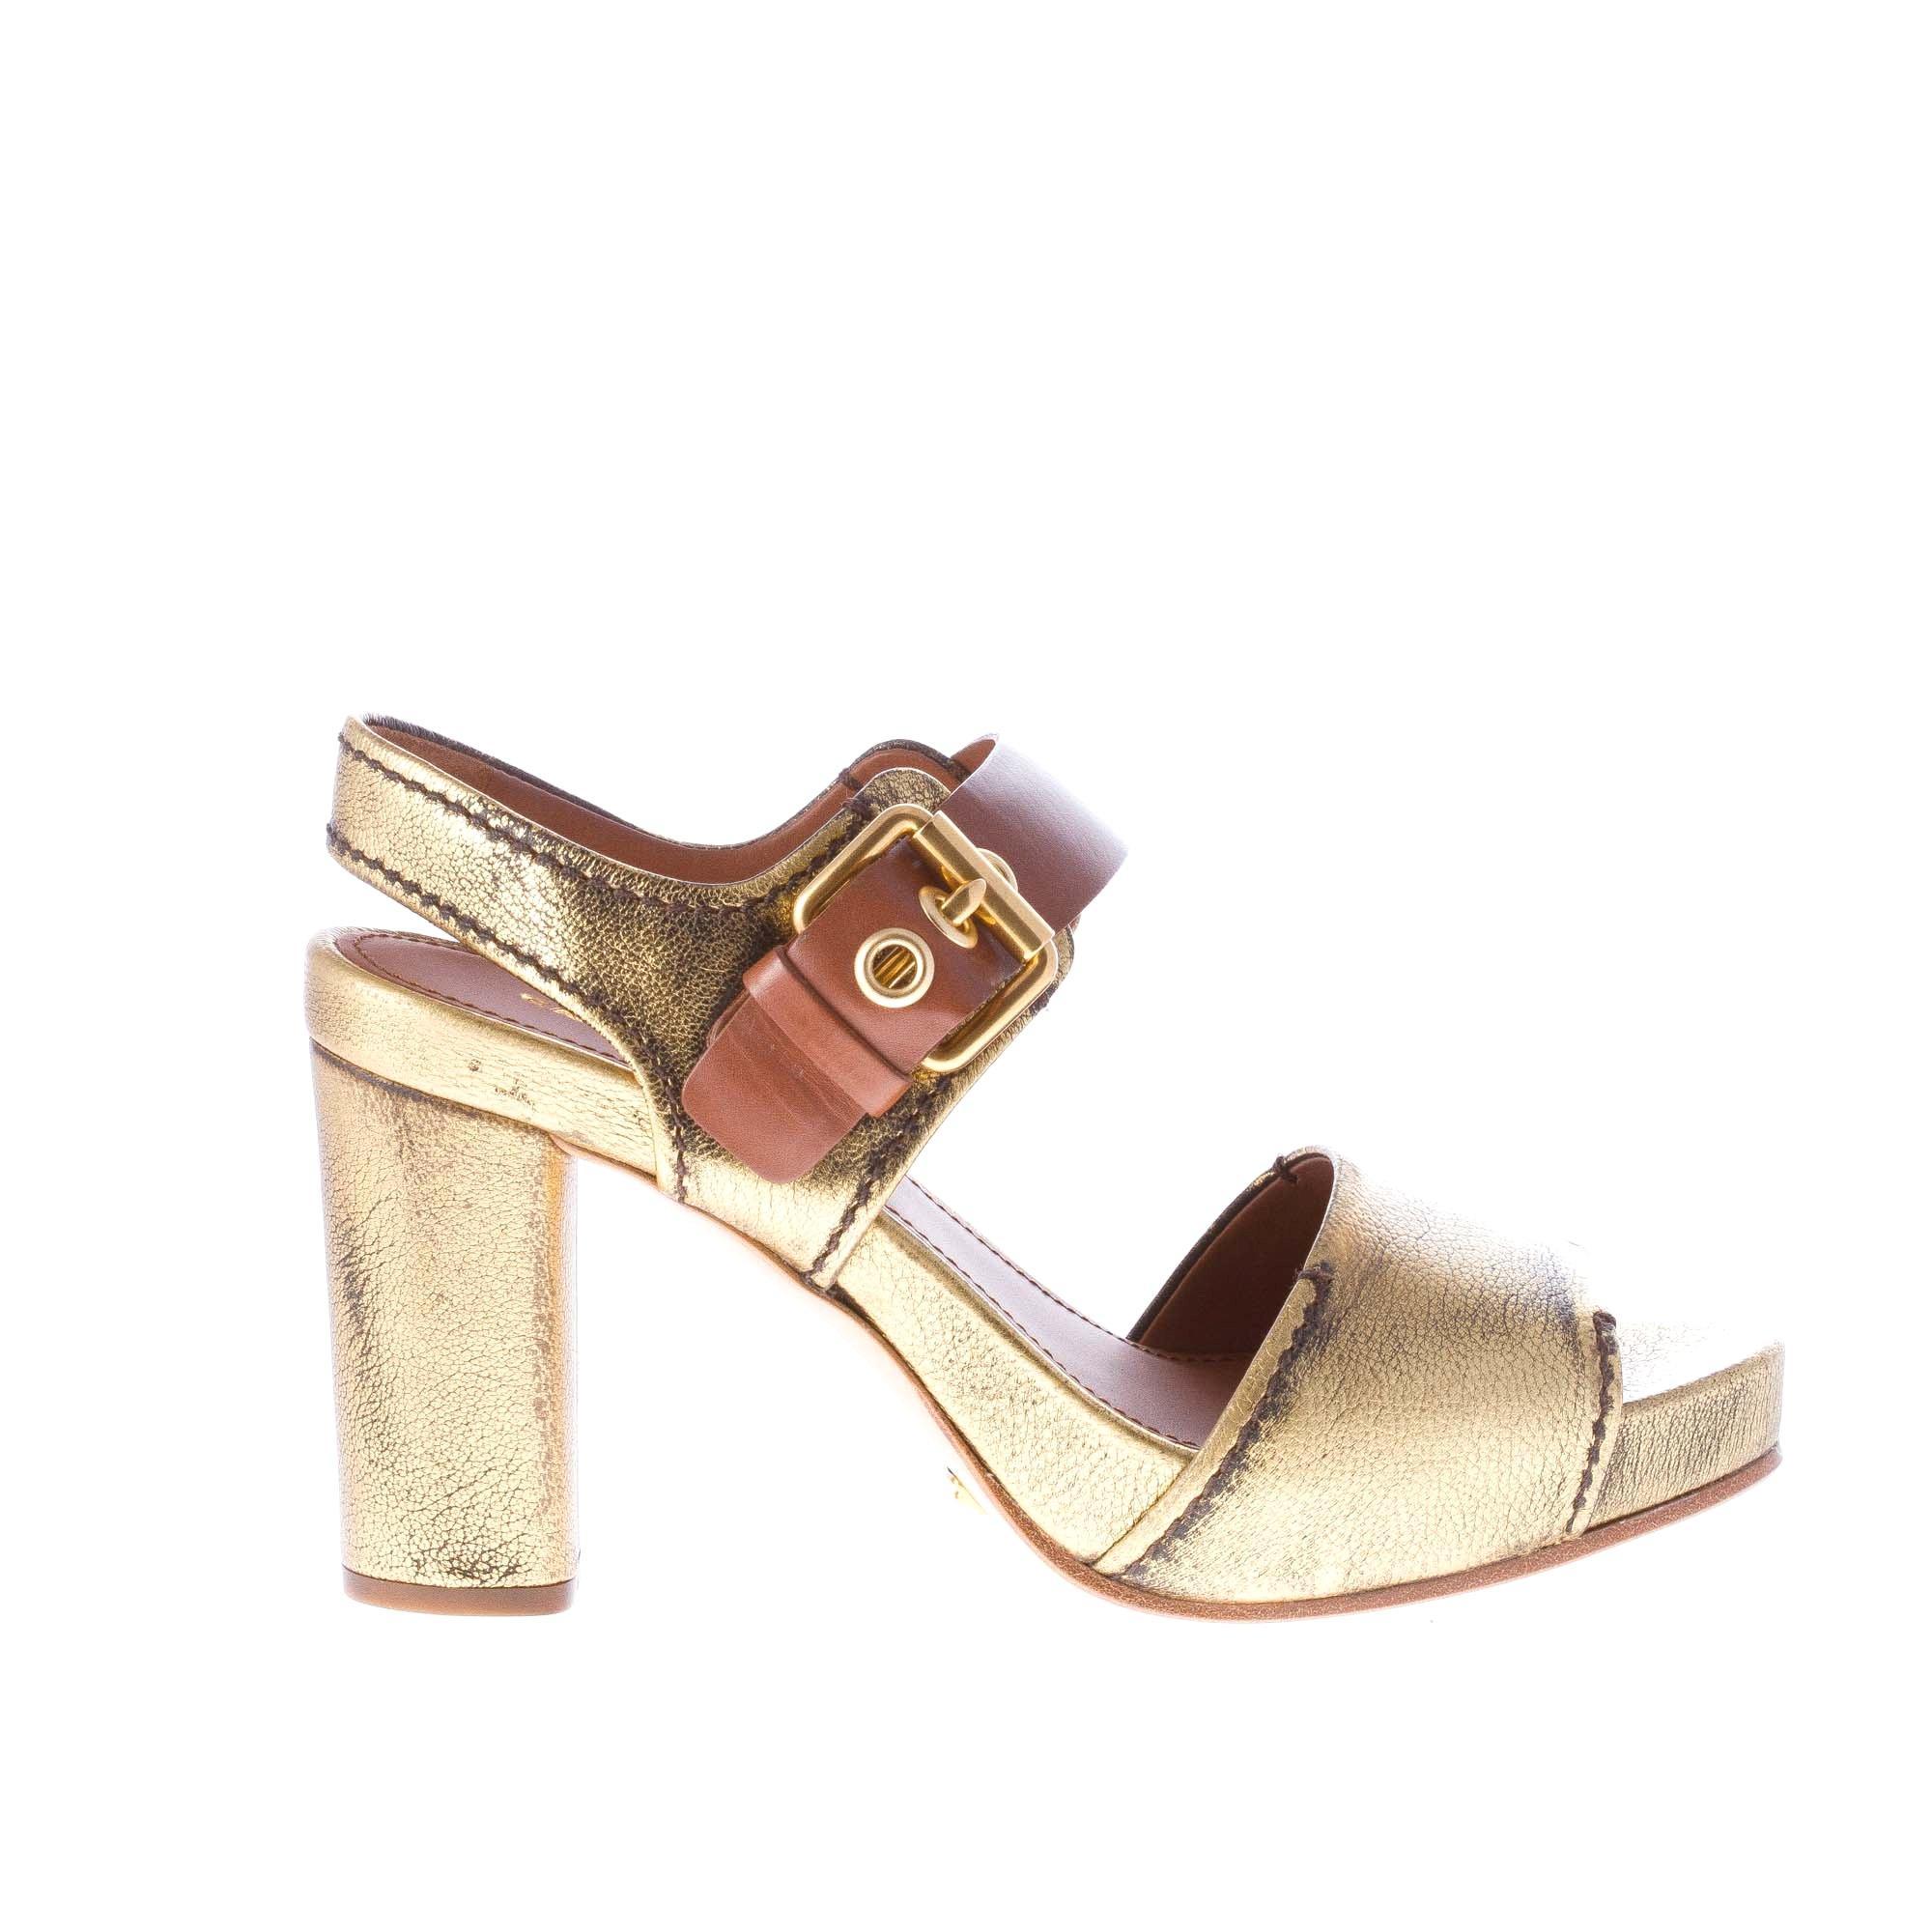 CAR SHOE Antiqued damen schuhe Damens schuhe Antiqued SHOE gold Leder Sandale with ankle strap ba4ac6